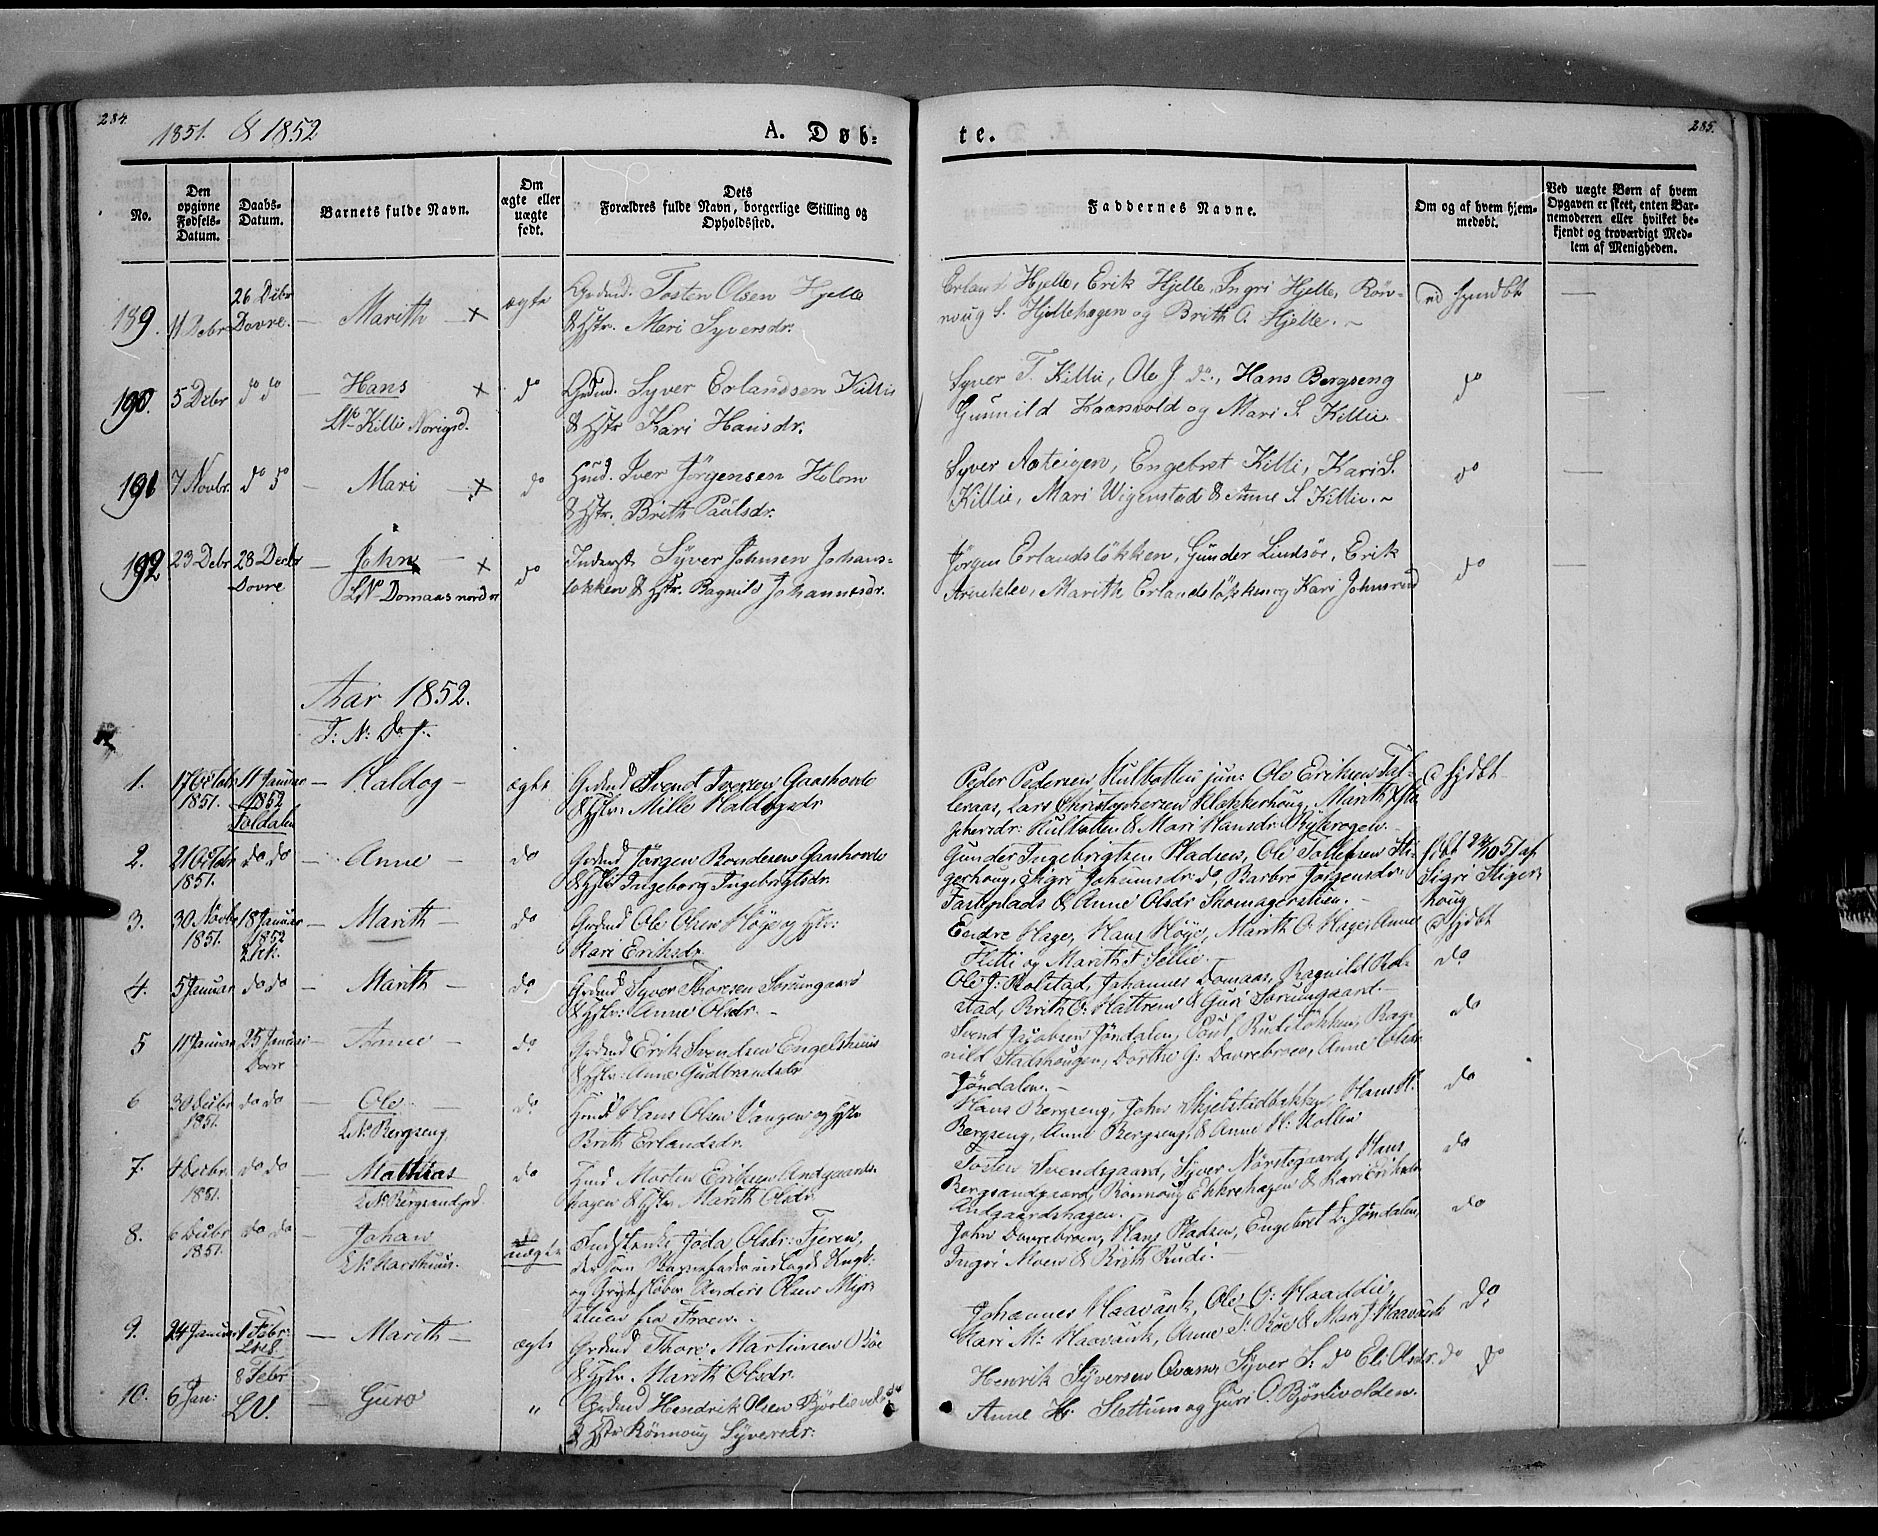 SAH, Lesja prestekontor, Ministerialbok nr. 6A, 1843-1854, s. 284-285